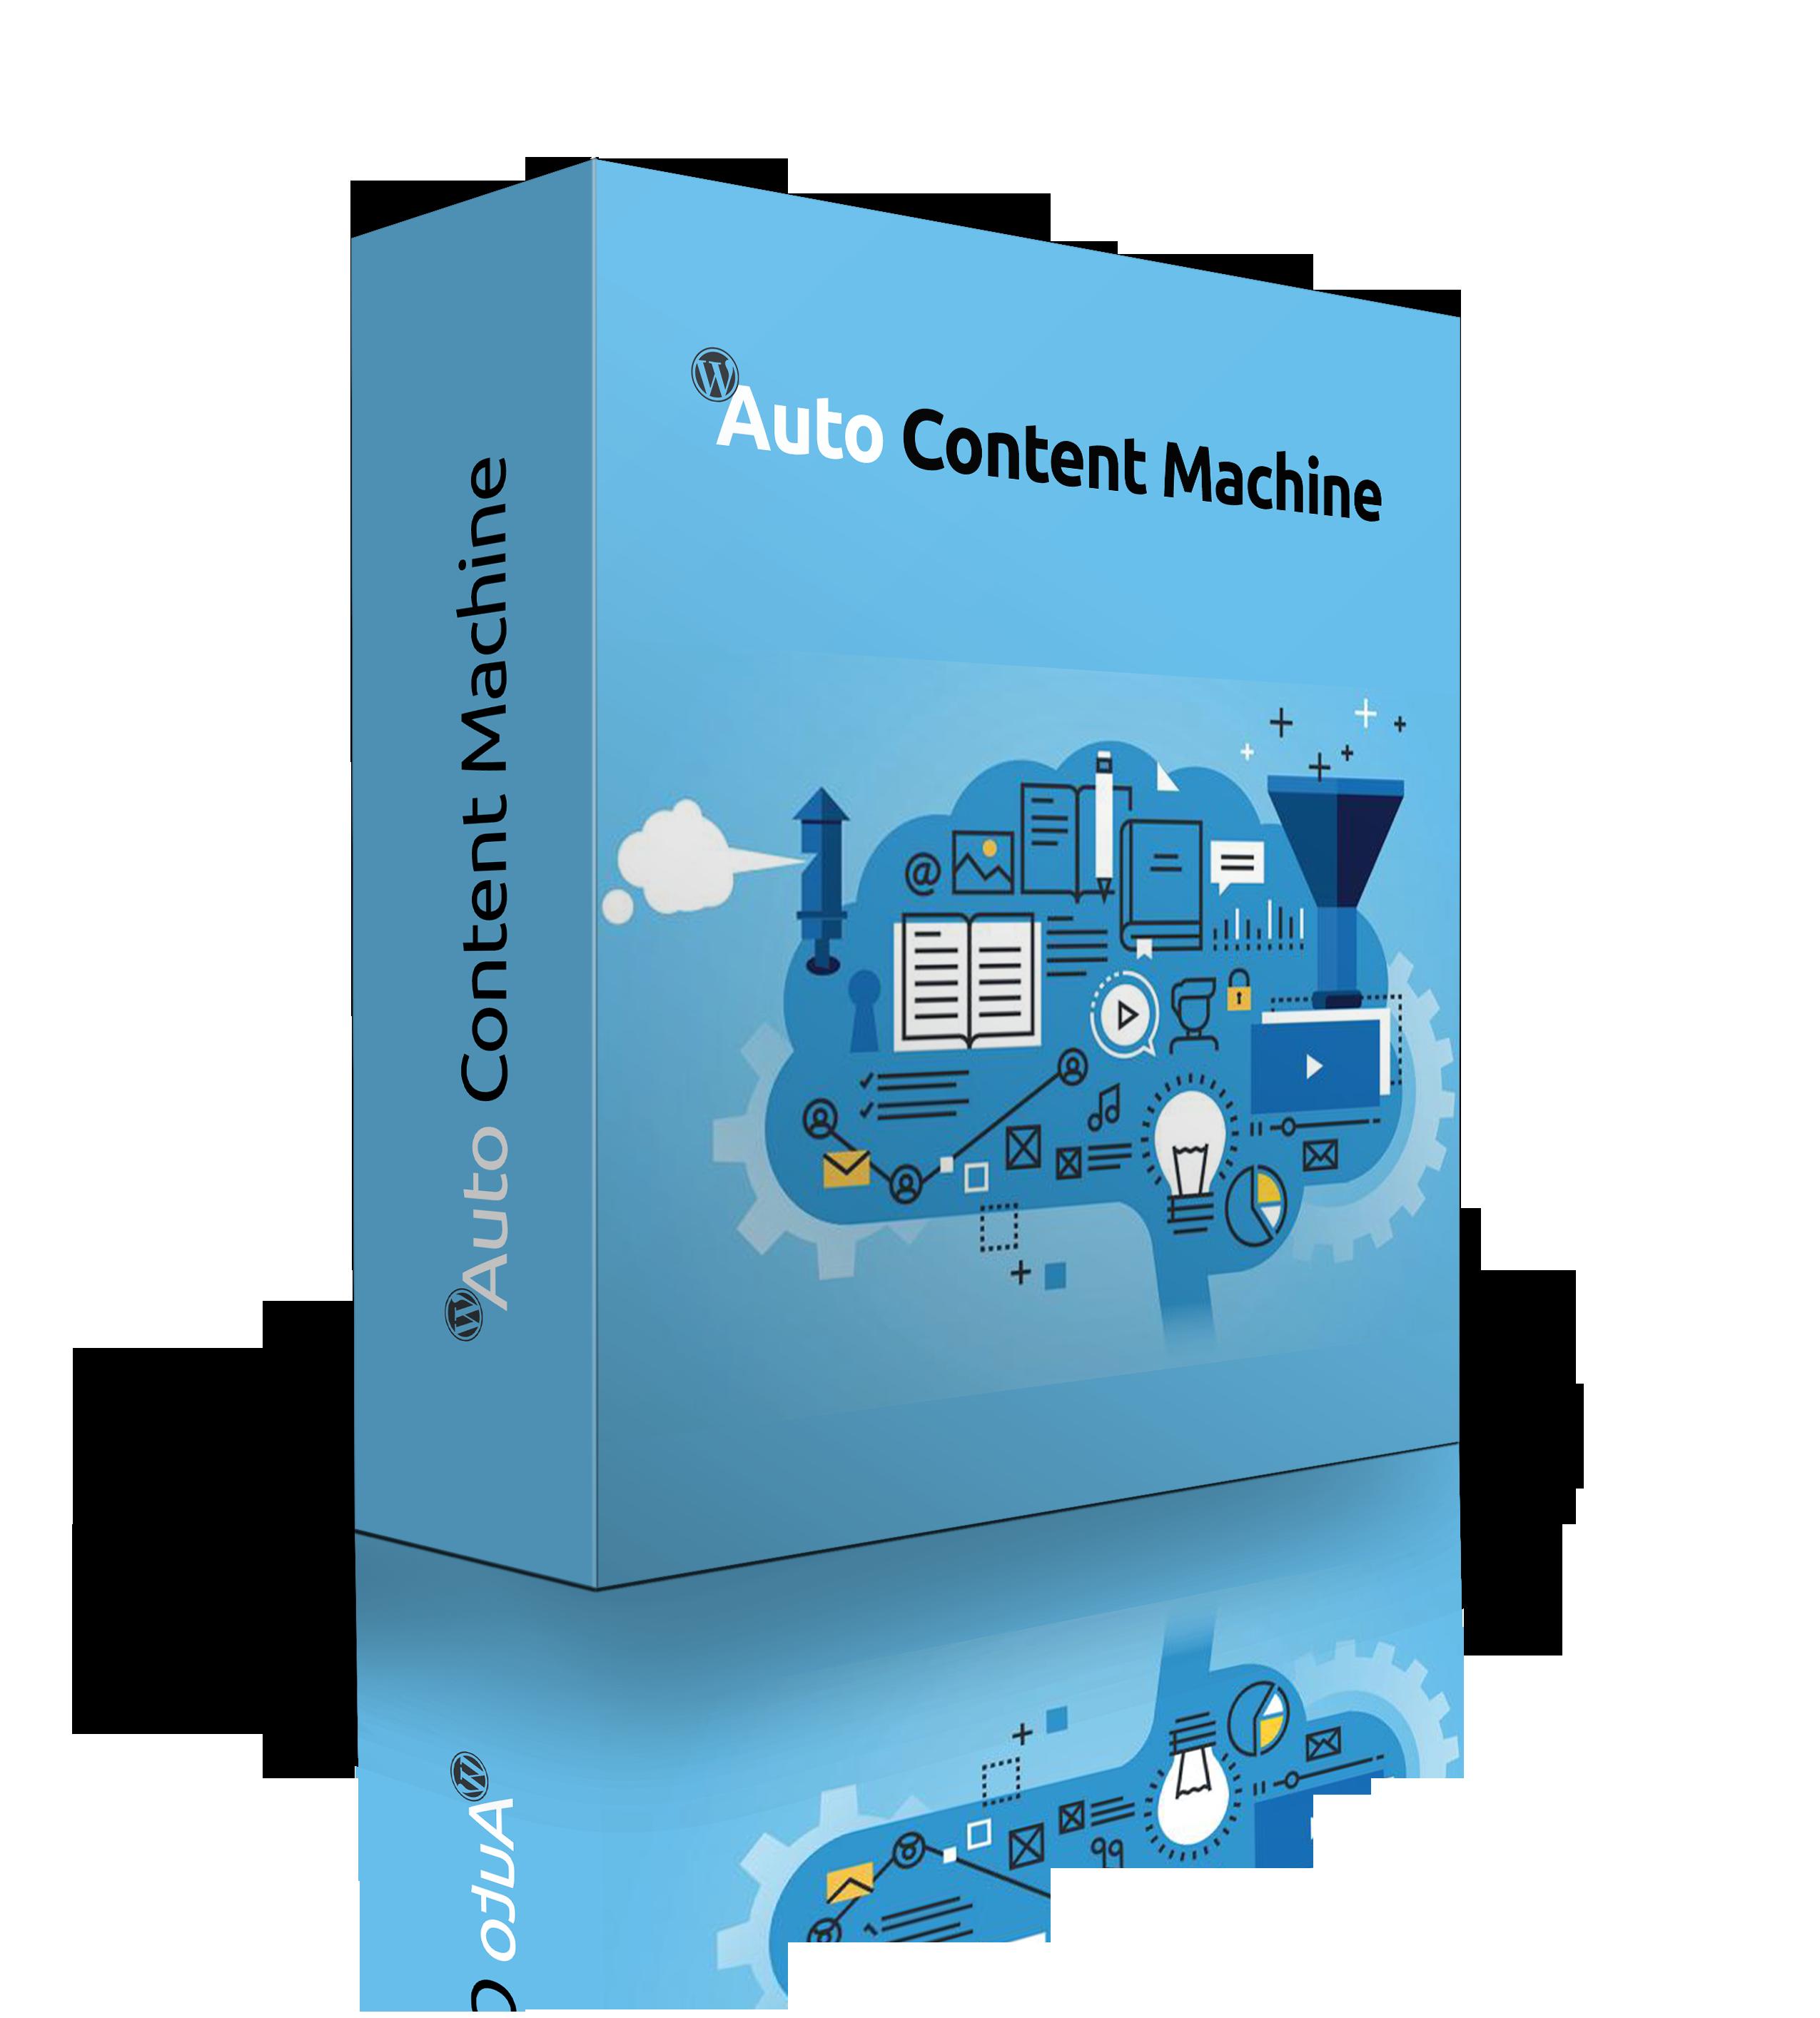 Auto content machine